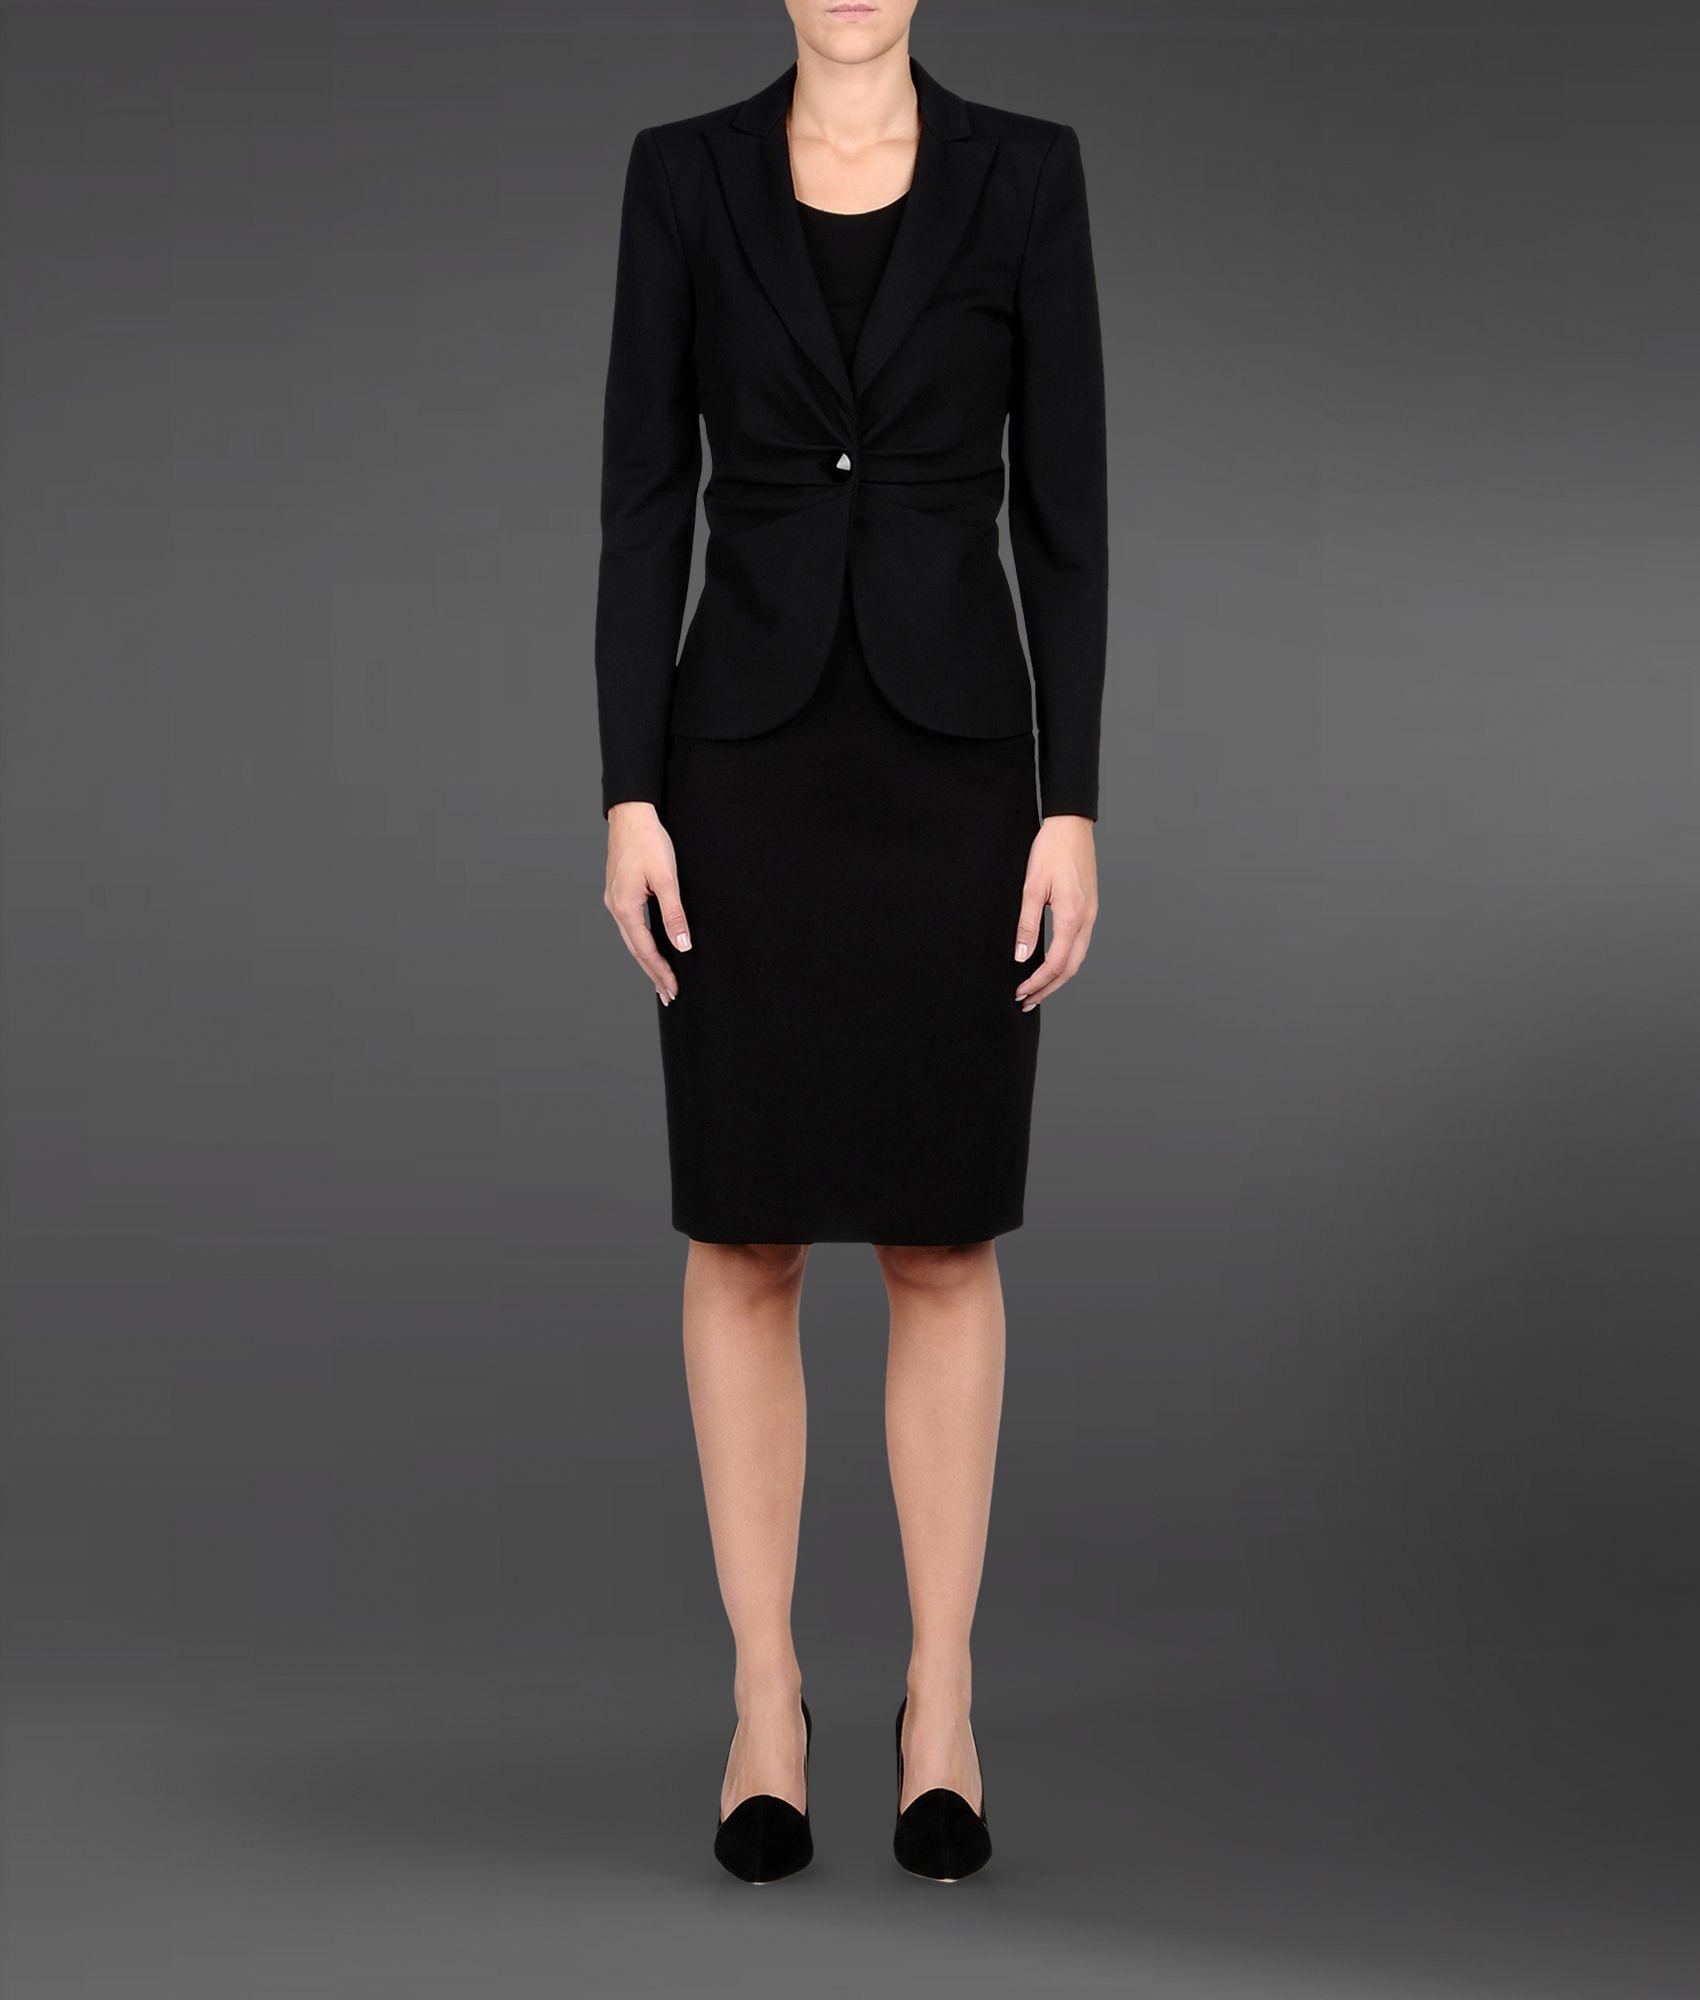 Lyst - Armani Womens Suit in Black